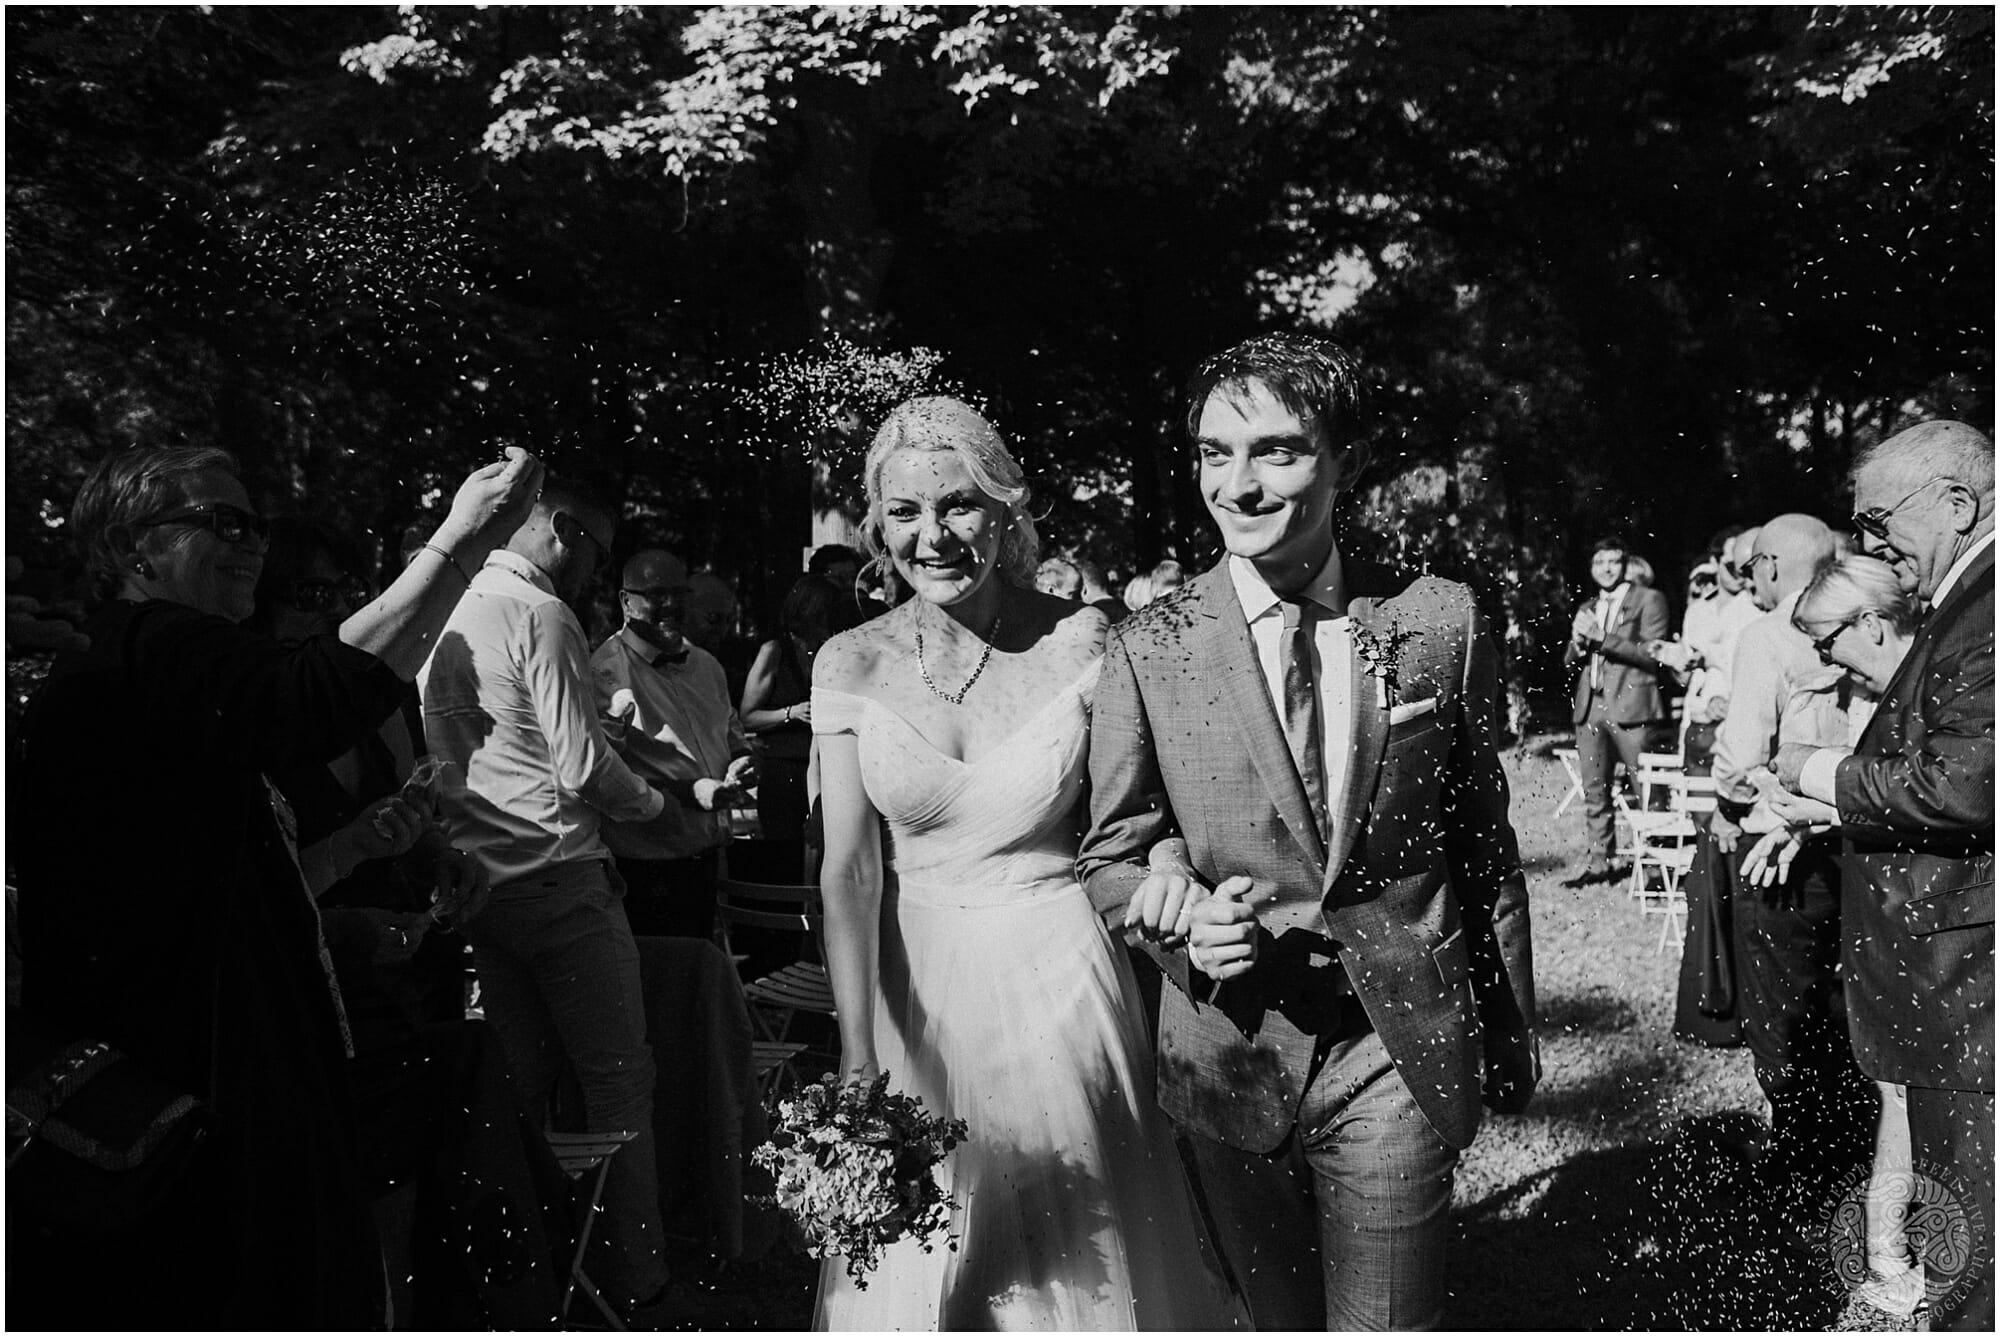 Kateryna-photos-photographe-mariage-chateau-des-3-fontaines-provence-avignon-vaucluse-sud_0061.jpg